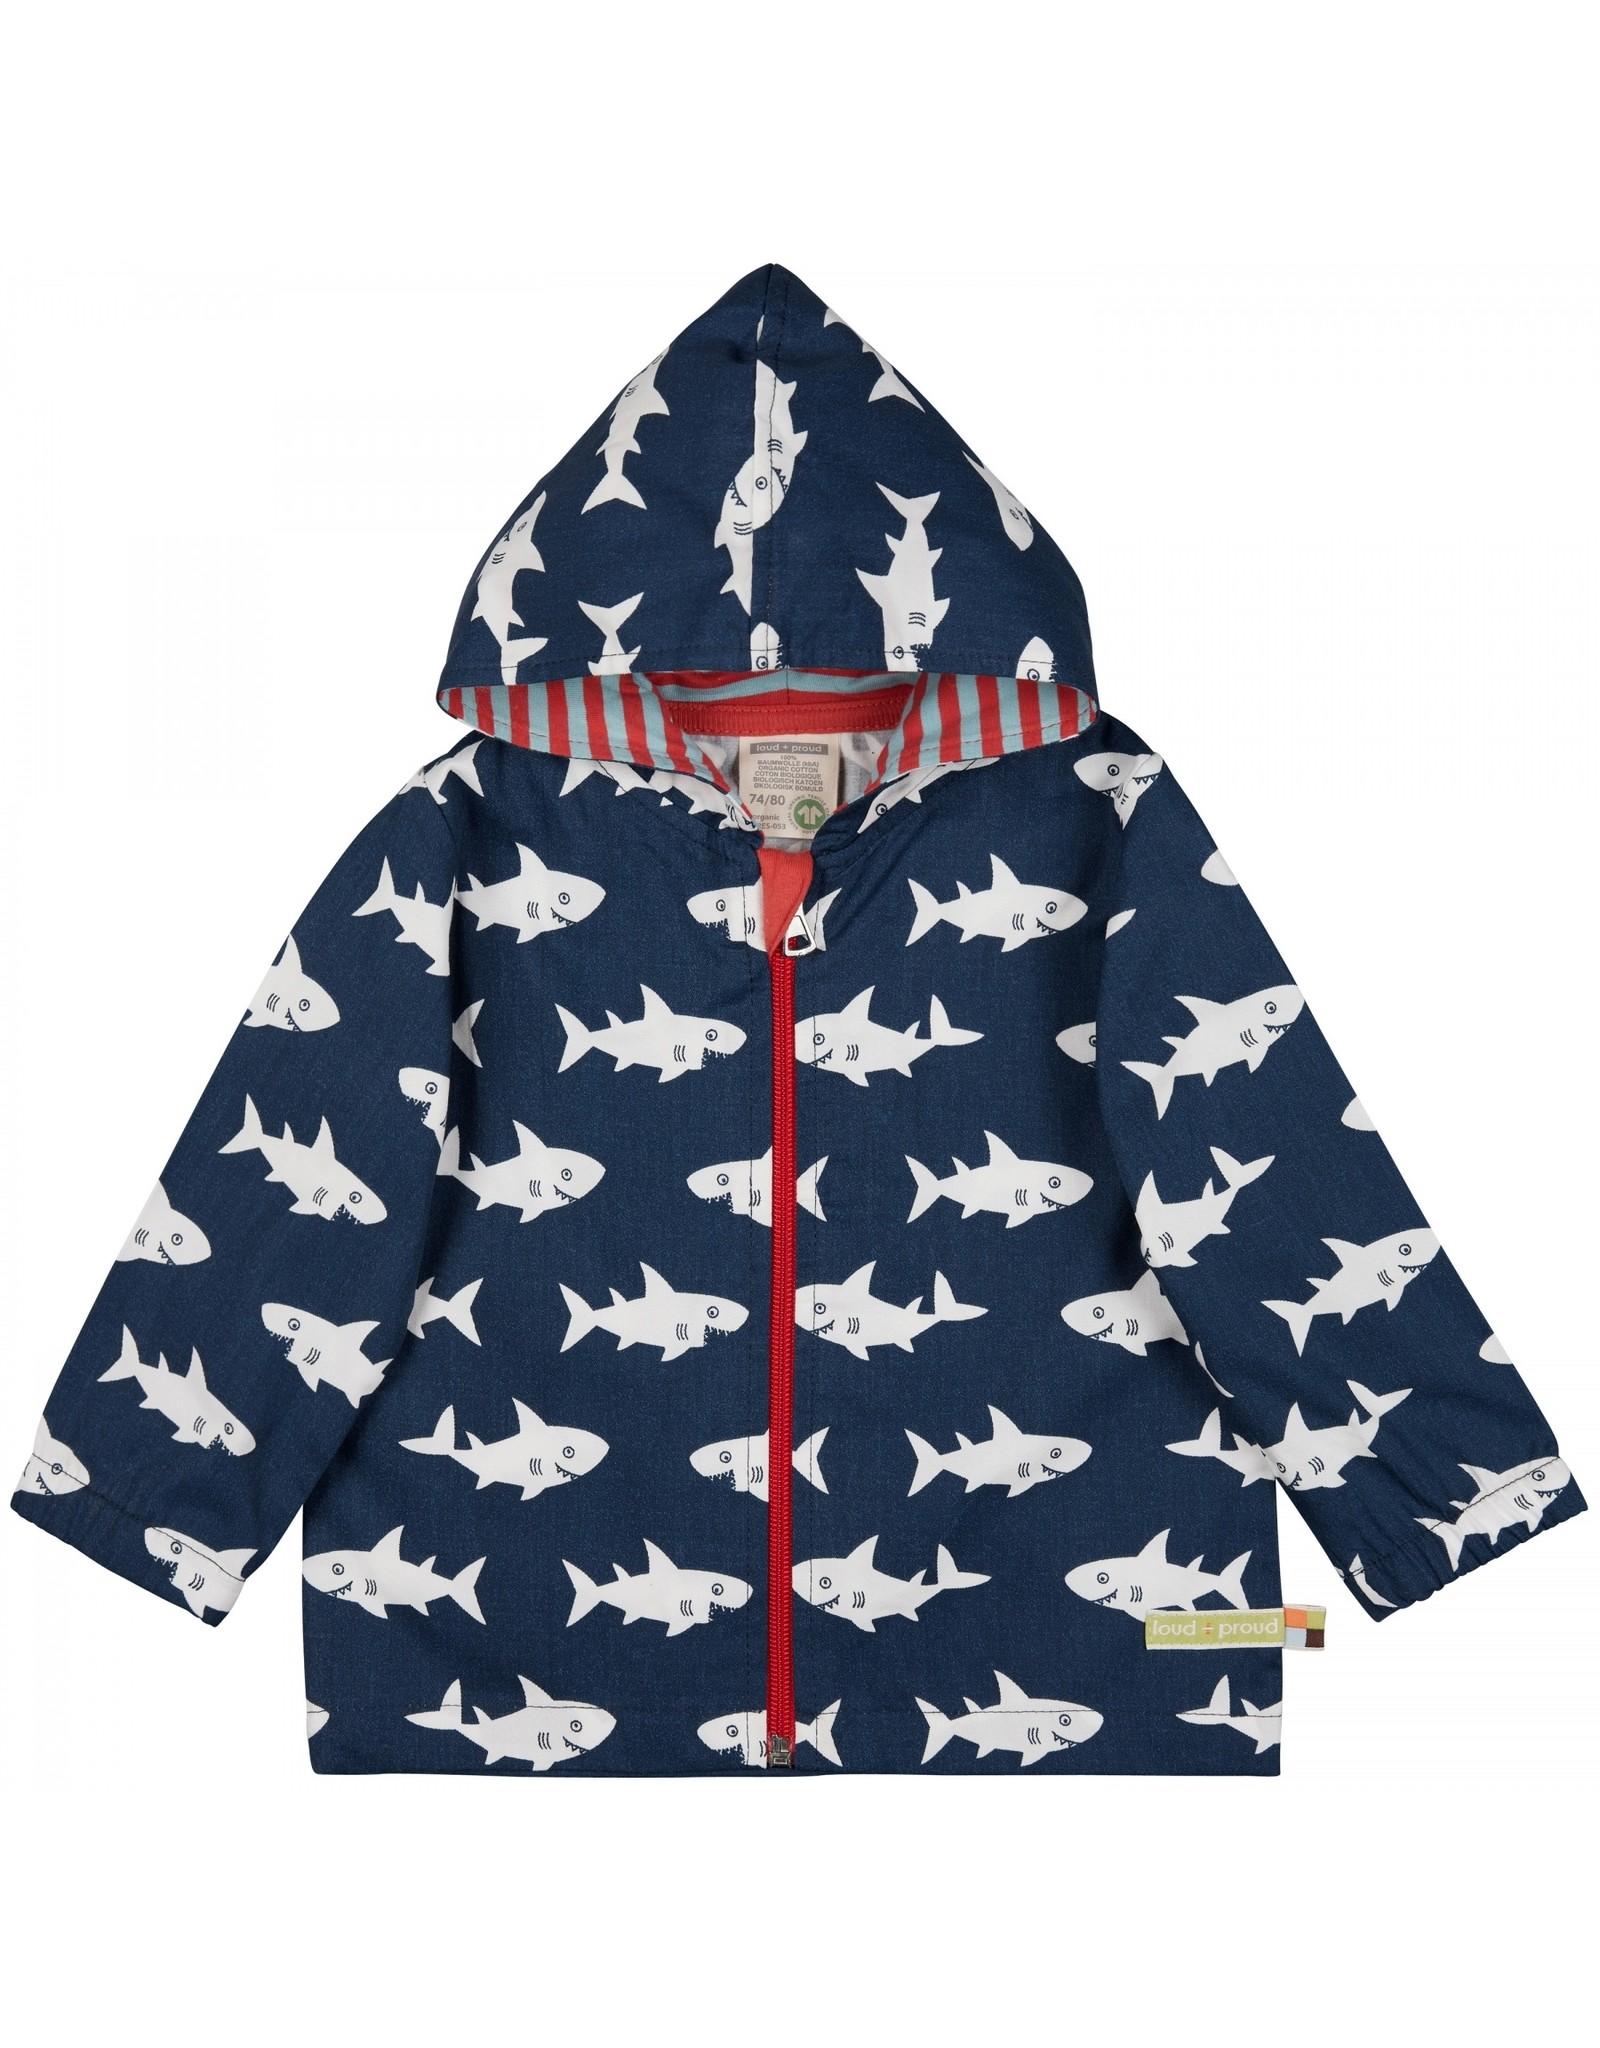 loud+proud Children's outdoor jacket - blue with sharks